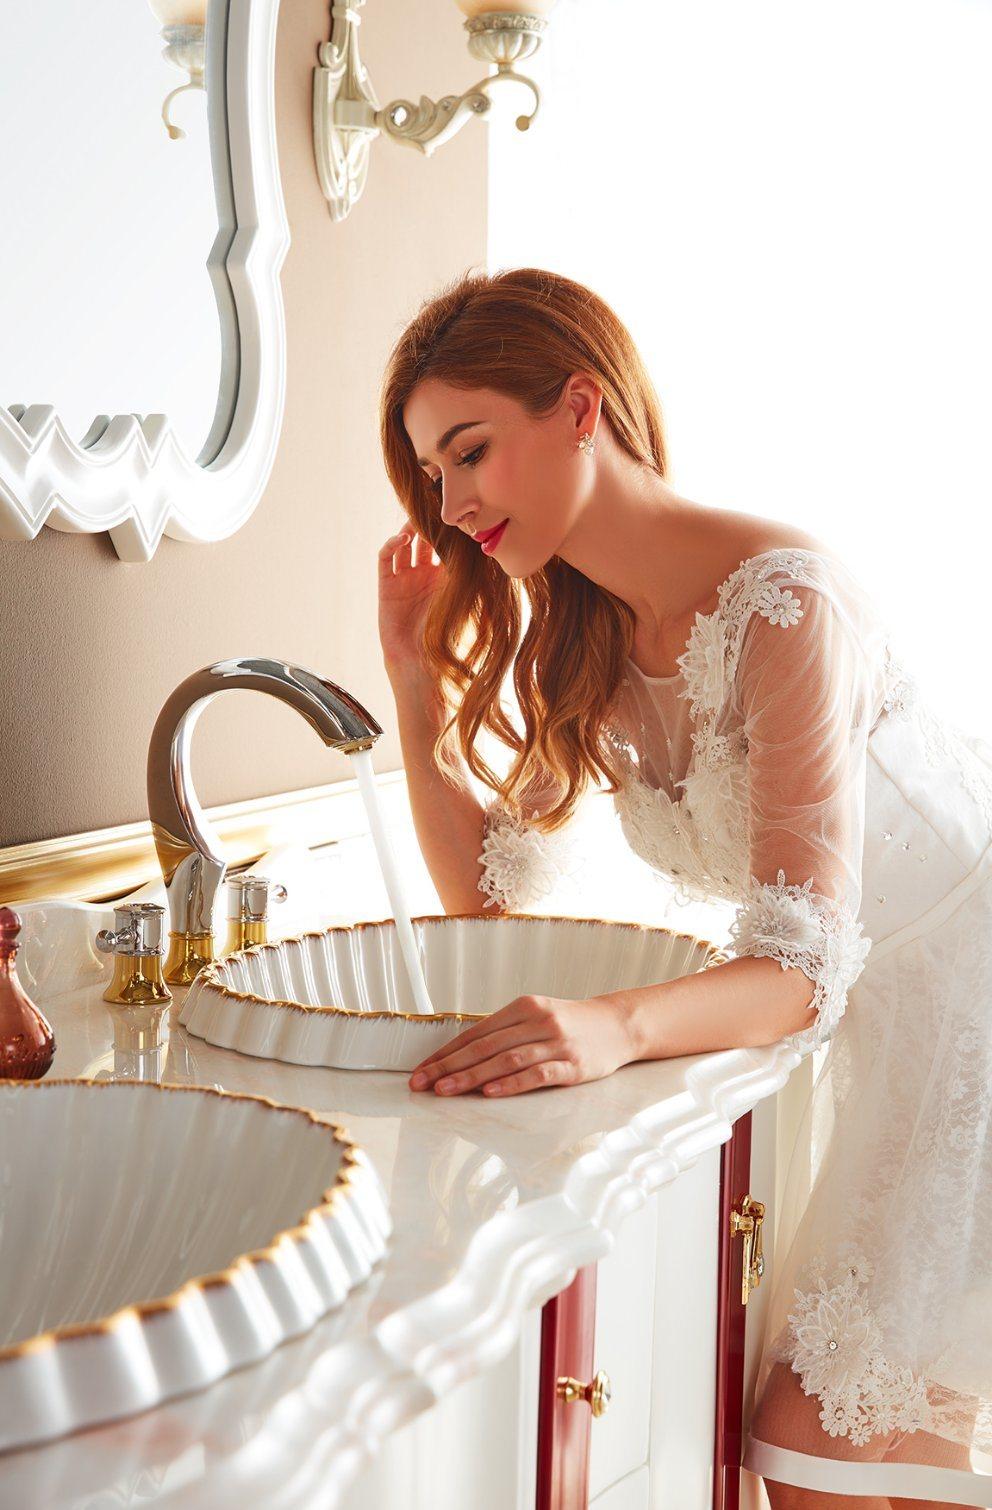 Antique Design Bathroom Vanity Sw-63028-16